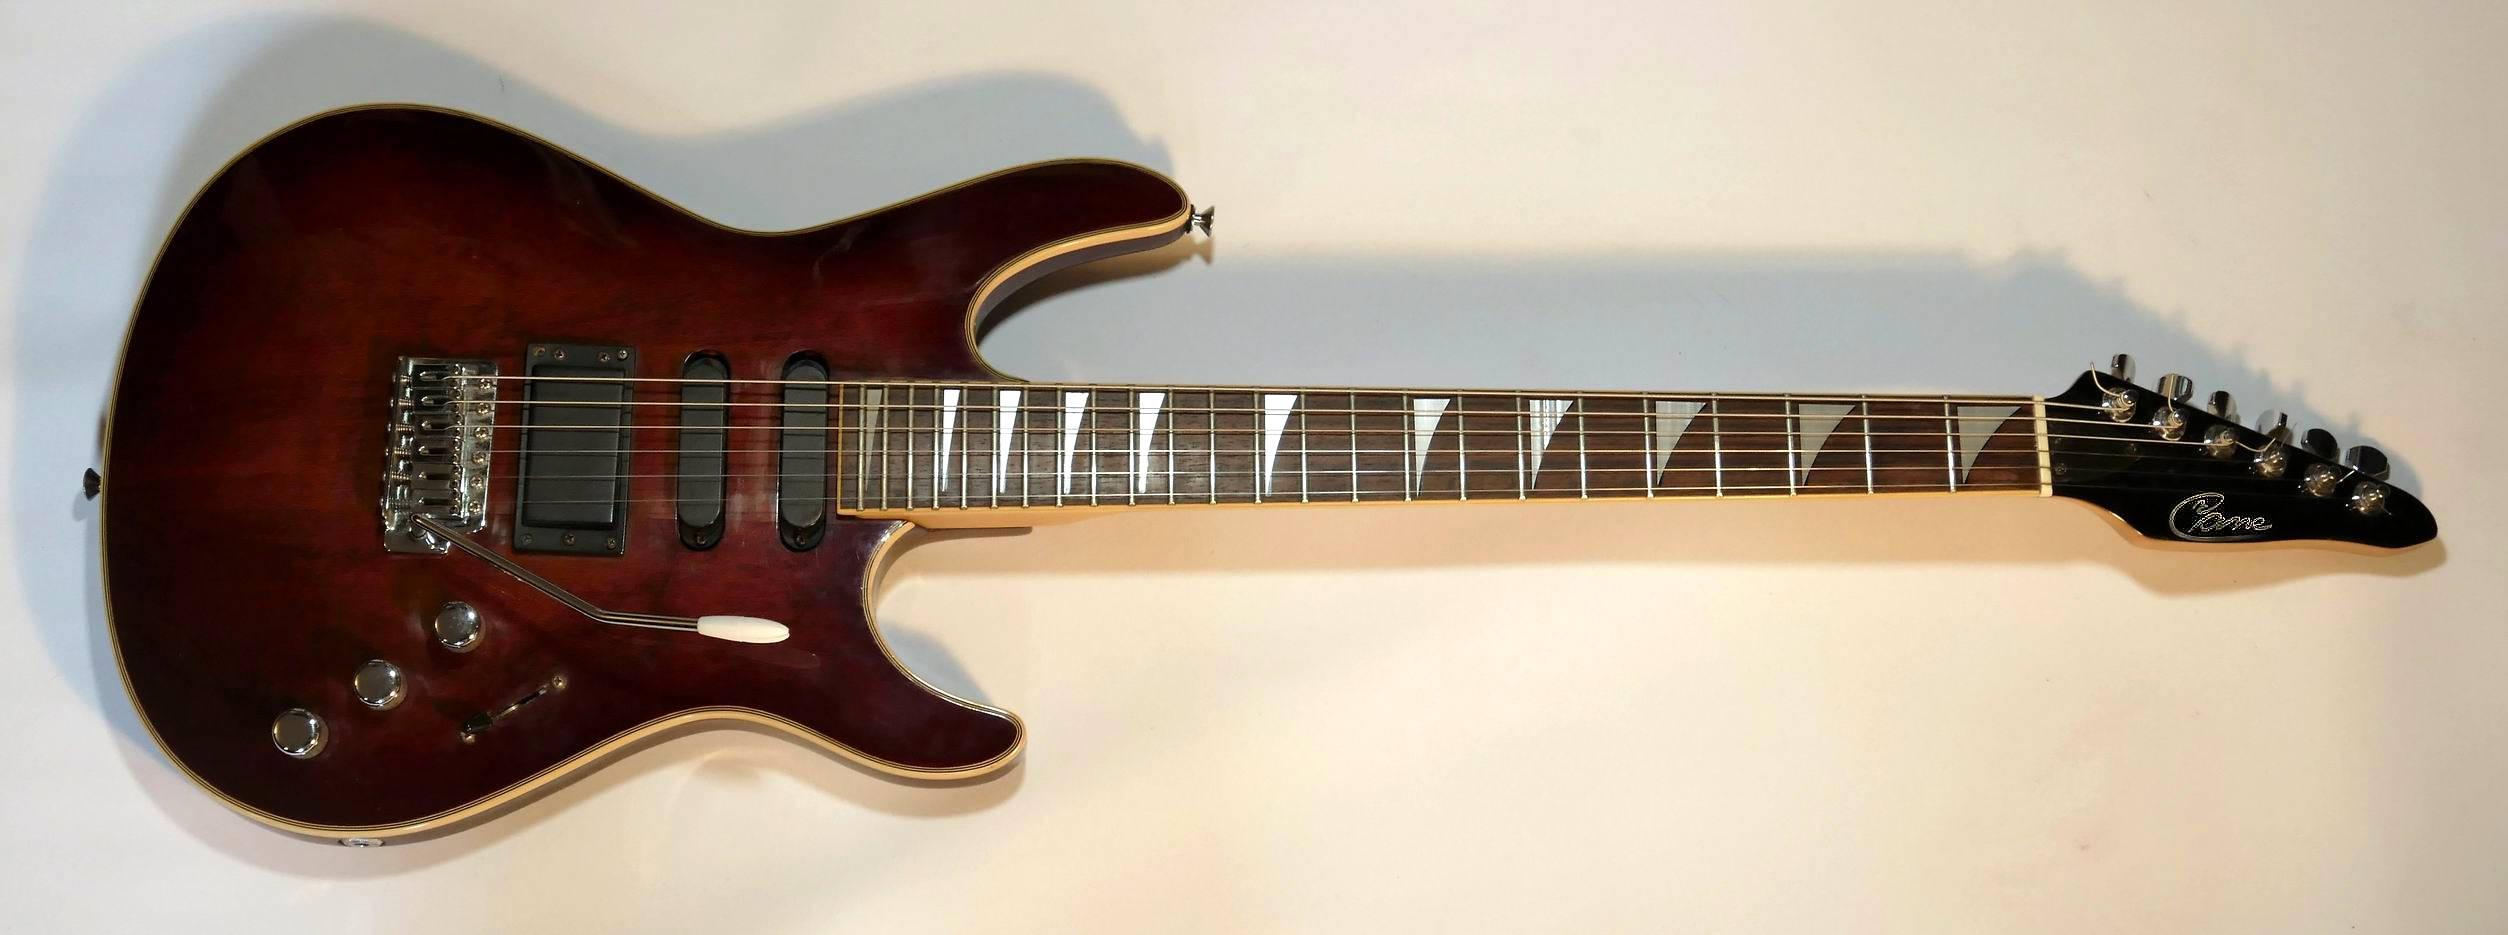 E-Gitarre CANE, gebraucht